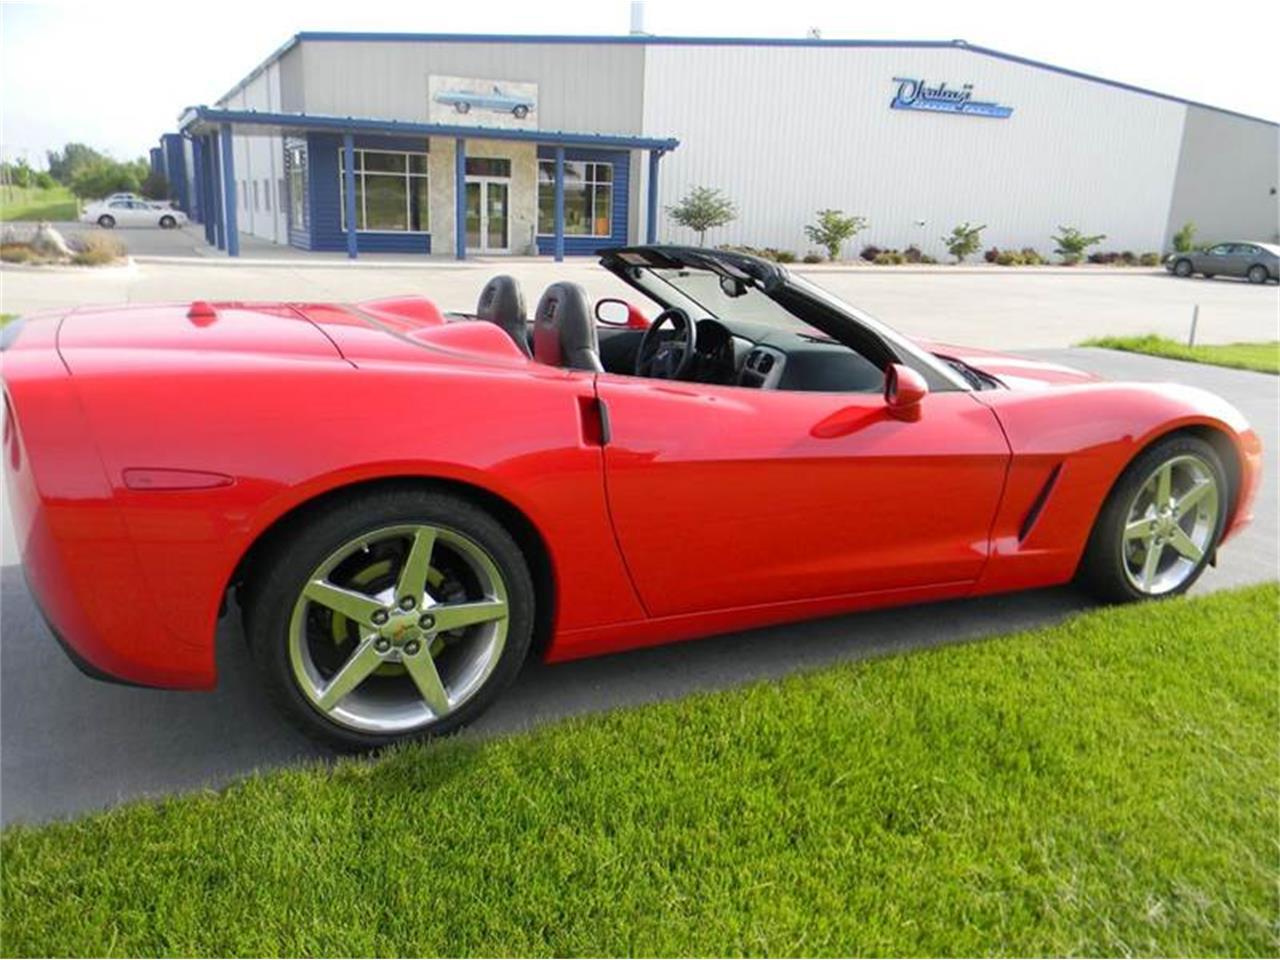 2005 Chevrolet Corvette (CC-694897) for sale in West Okoboji, Iowa